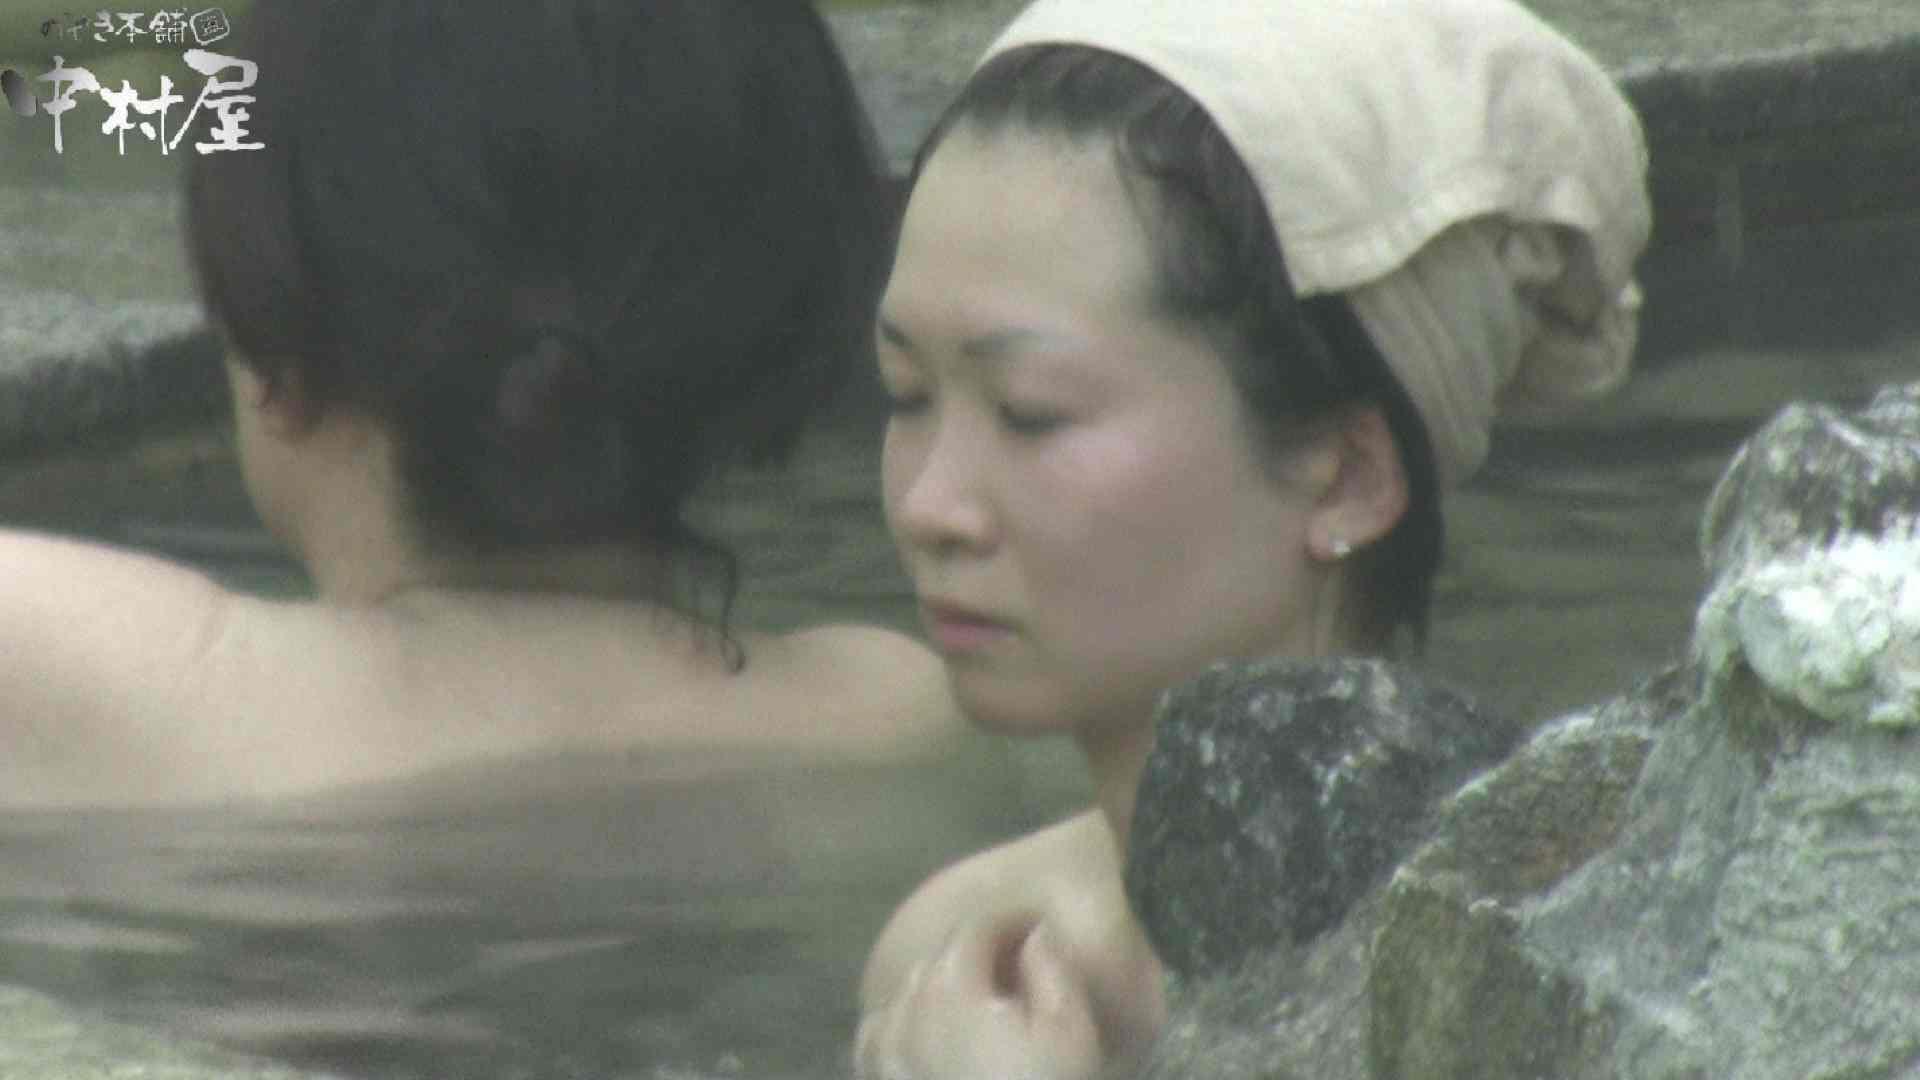 Aquaな露天風呂Vol.906 露天風呂編  86PIX 86